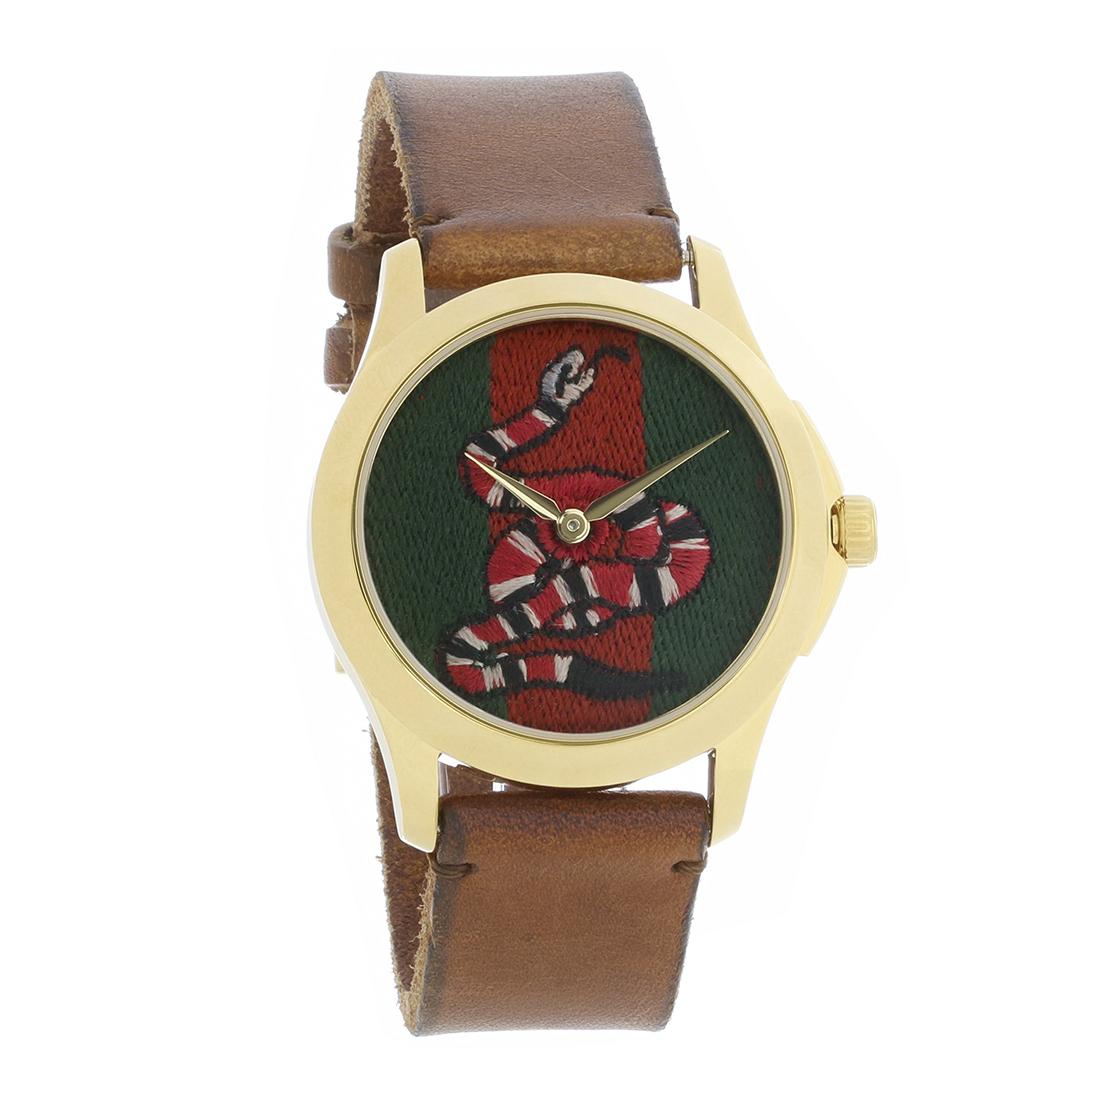 c8a982501bb Gucci 126 Le Marché Des Merveilles Series Mens Swiss Quartz Watch YA1264012